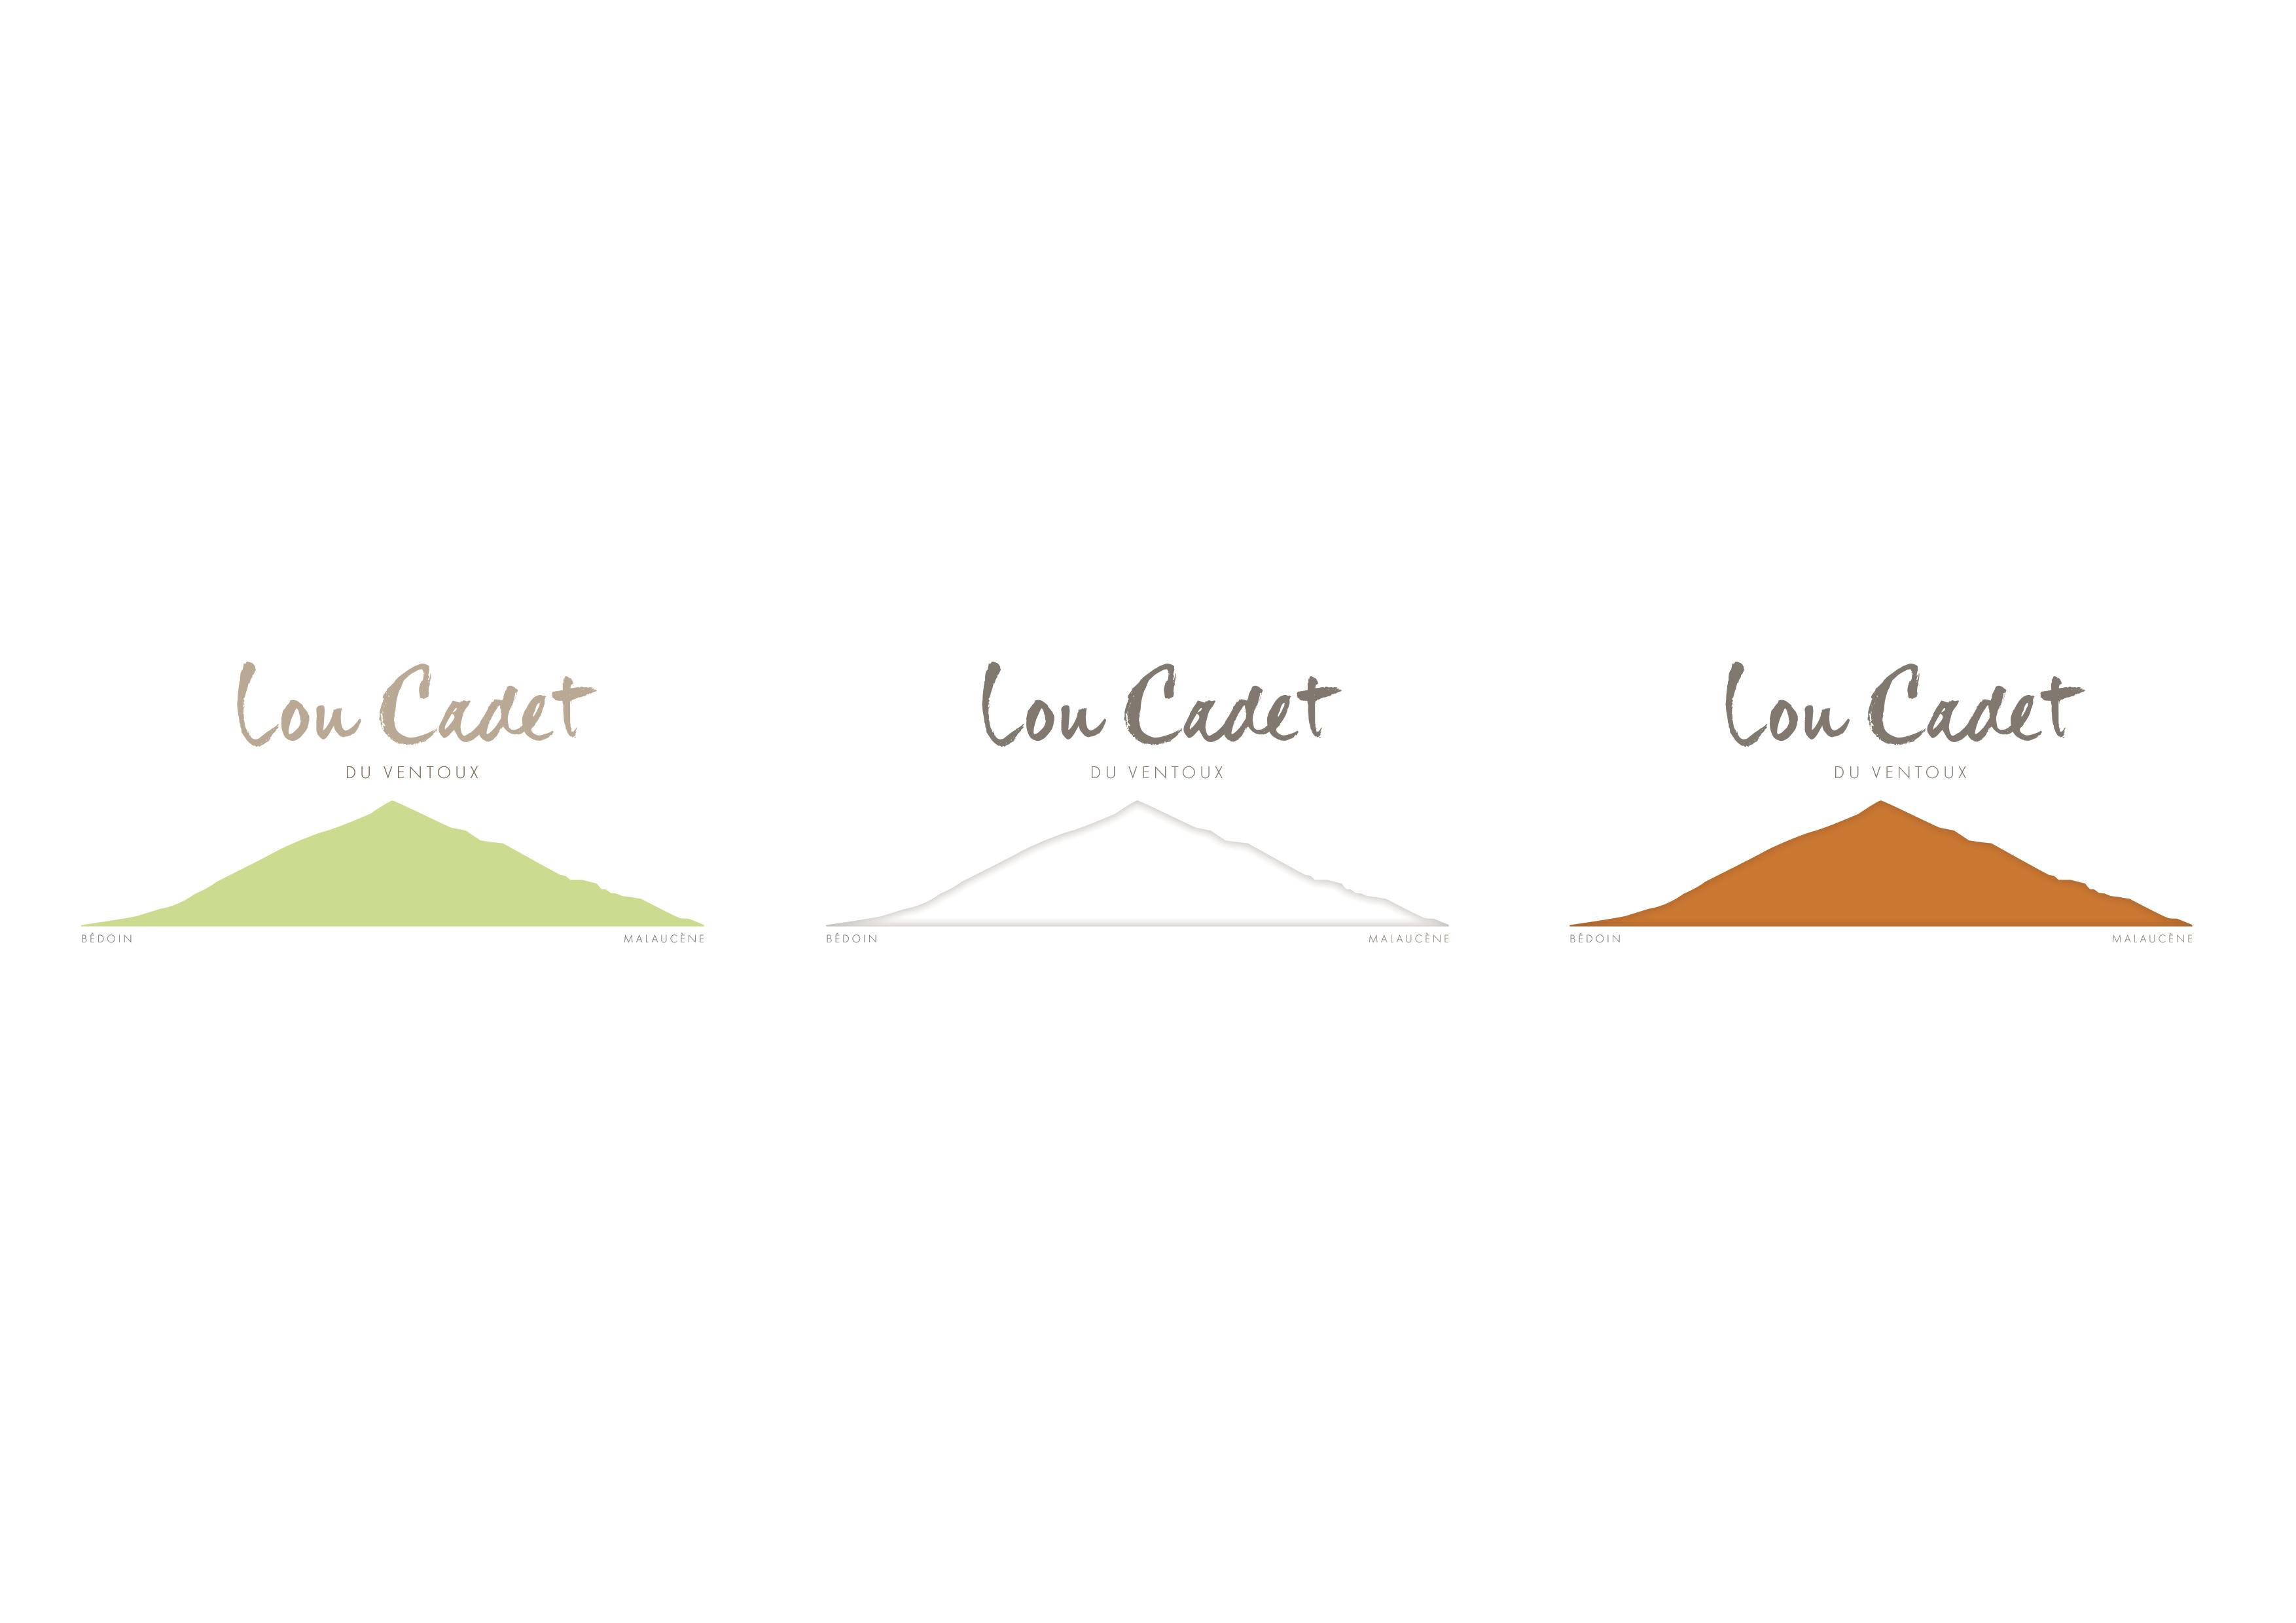 Csakébon - Lou Cadet - All rights reserved